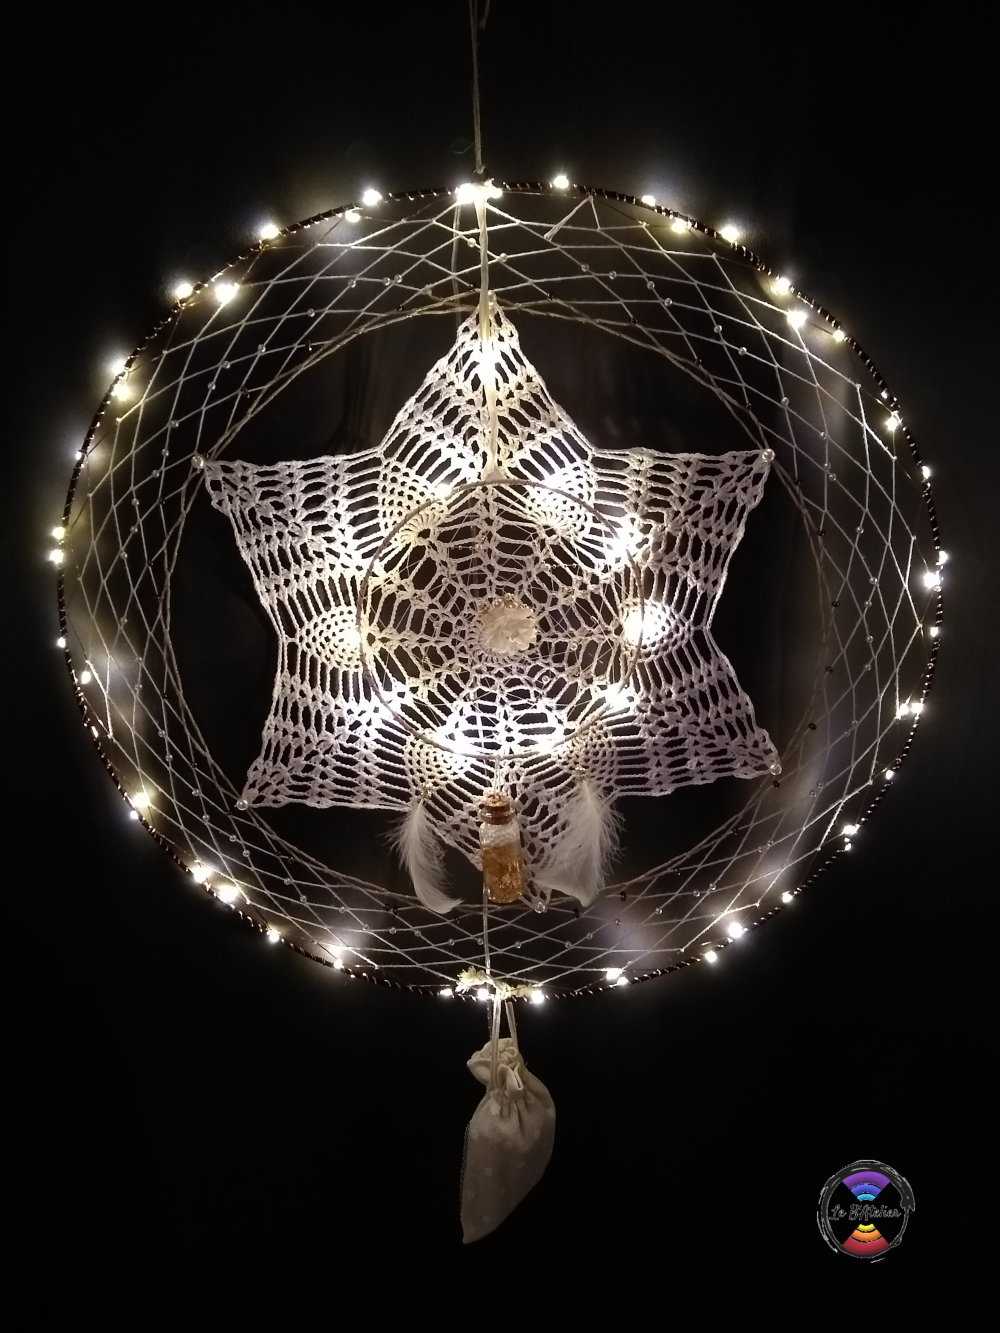 Grand Attrape-rêve Blanc illuminé / Idée cadeau de Noël